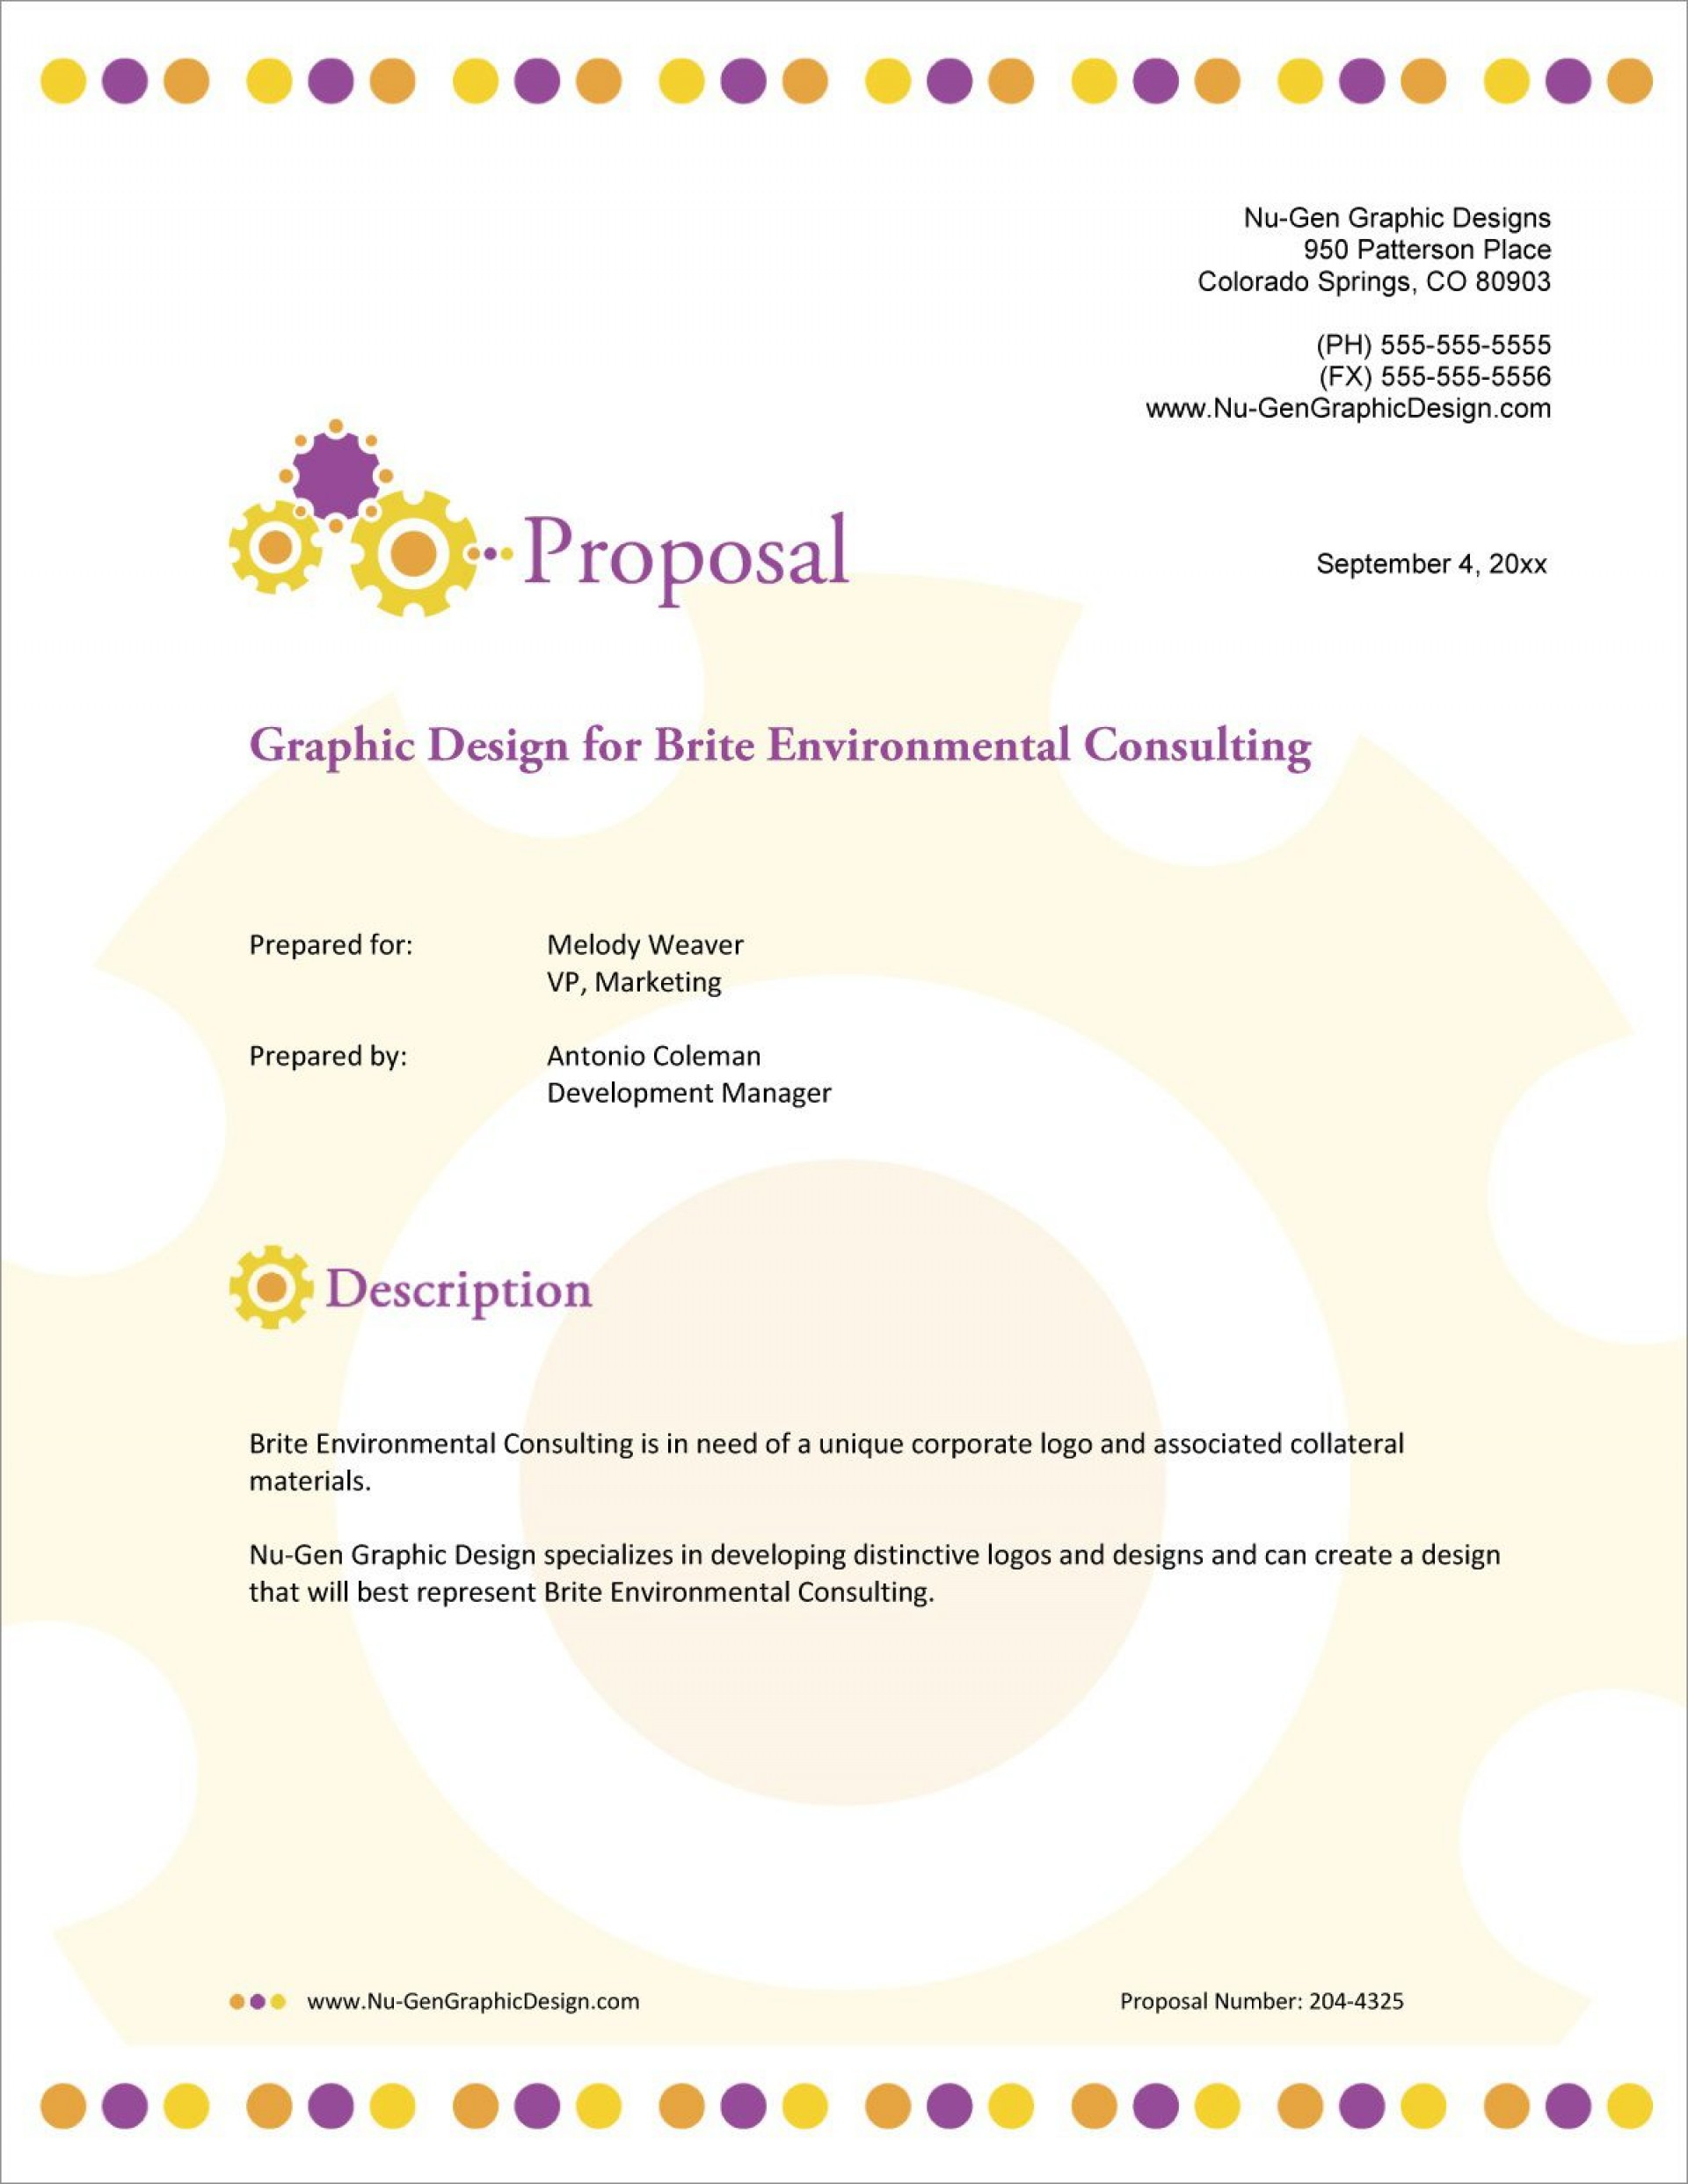 001 Incredible Graphic Design Proposal Sample Image  Pdf Free Template Indesign1920